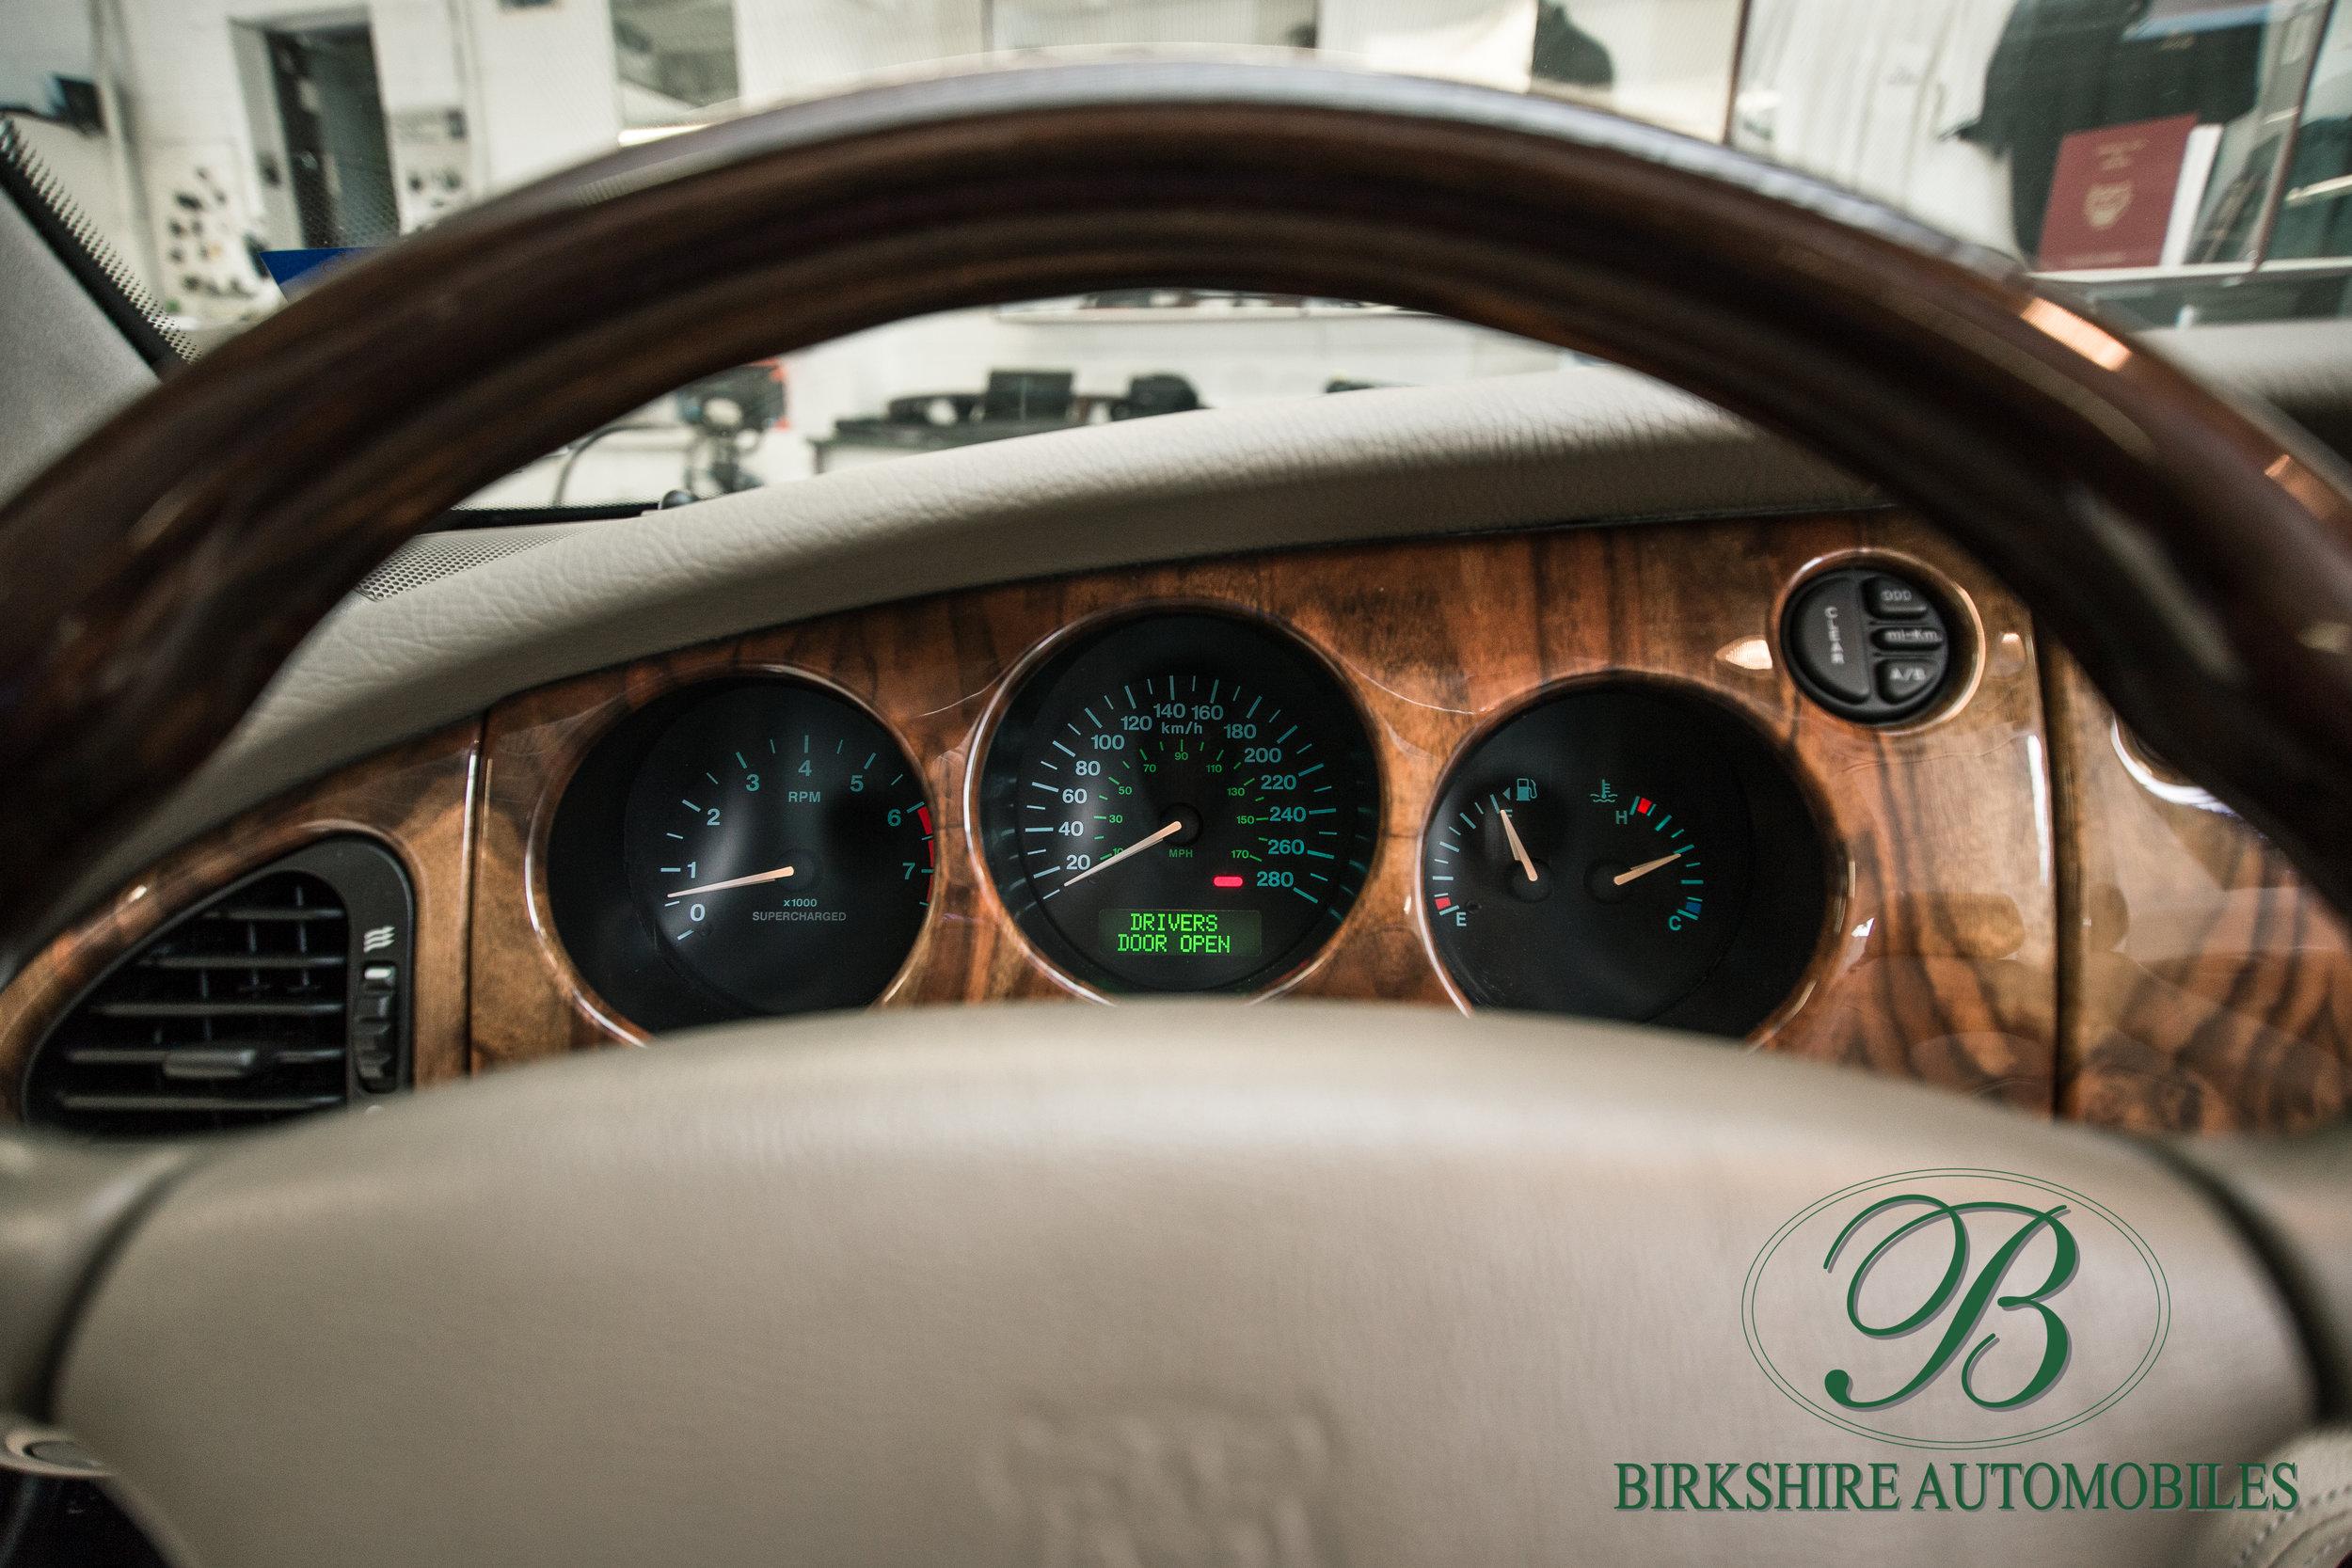 Birkshire Automobiles-2001 Jaguar XKR Convertible (29).jpg